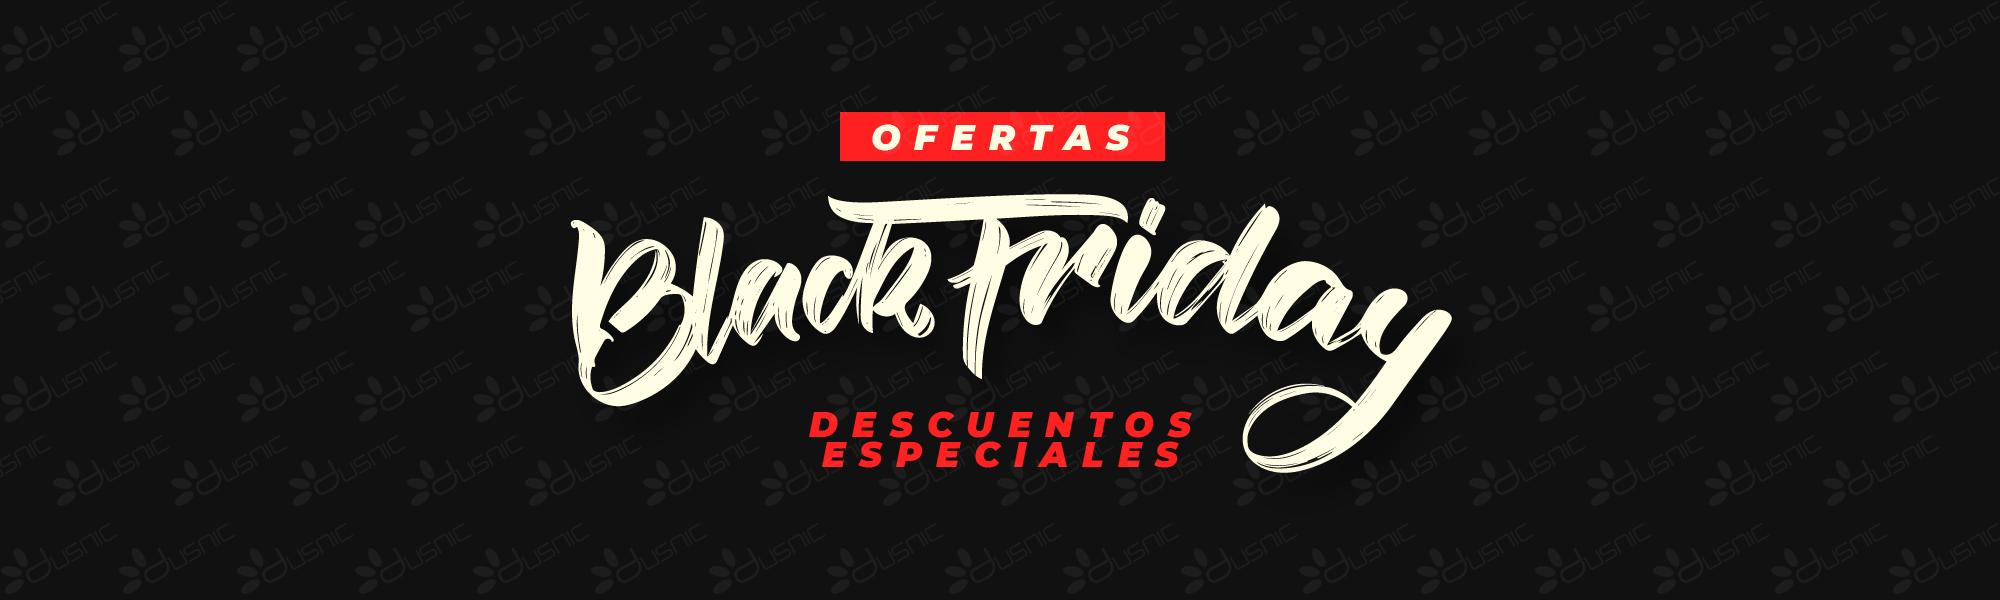 Slider Black Friday Clásico